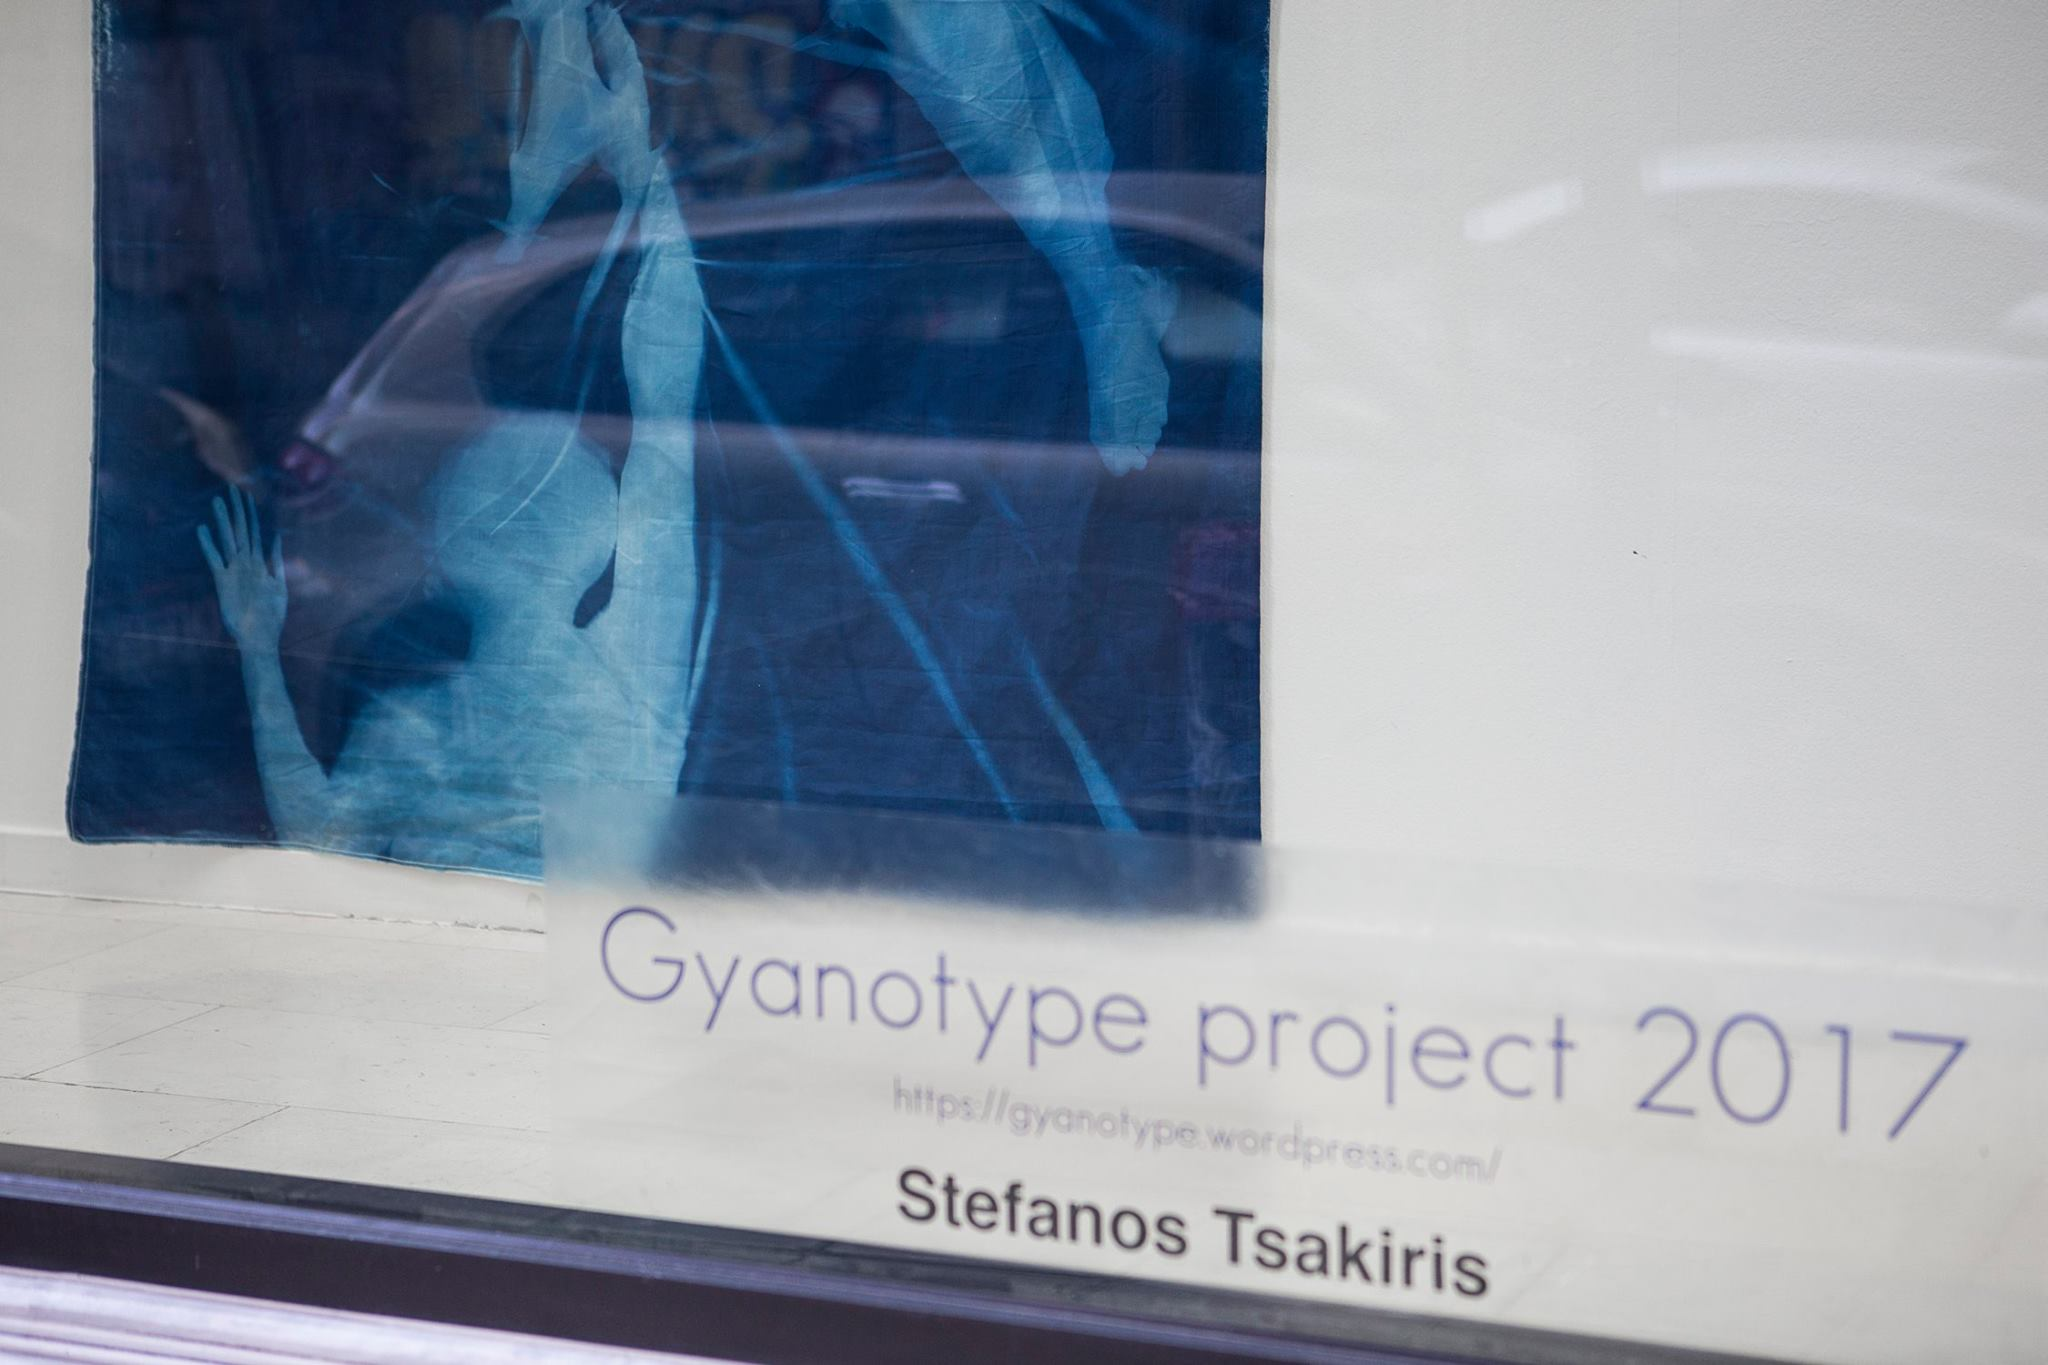 Gyanotype